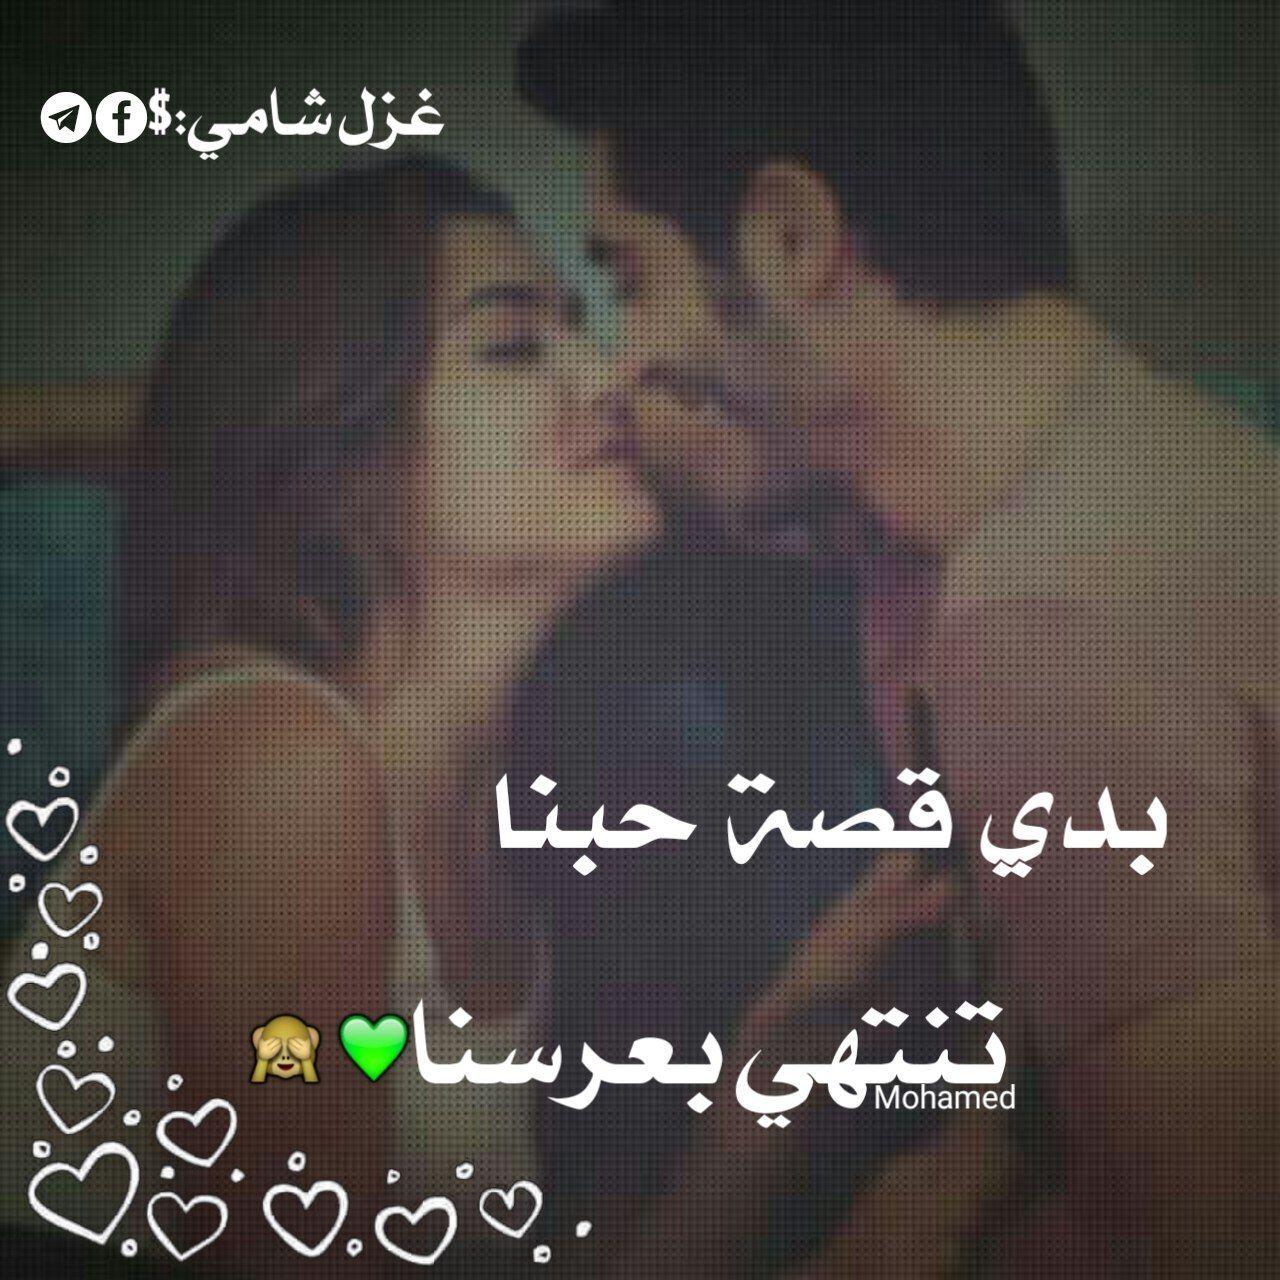 Pin by بغدادية 😻 on رمزيات✋️ | Love quotes, Arabic quotes